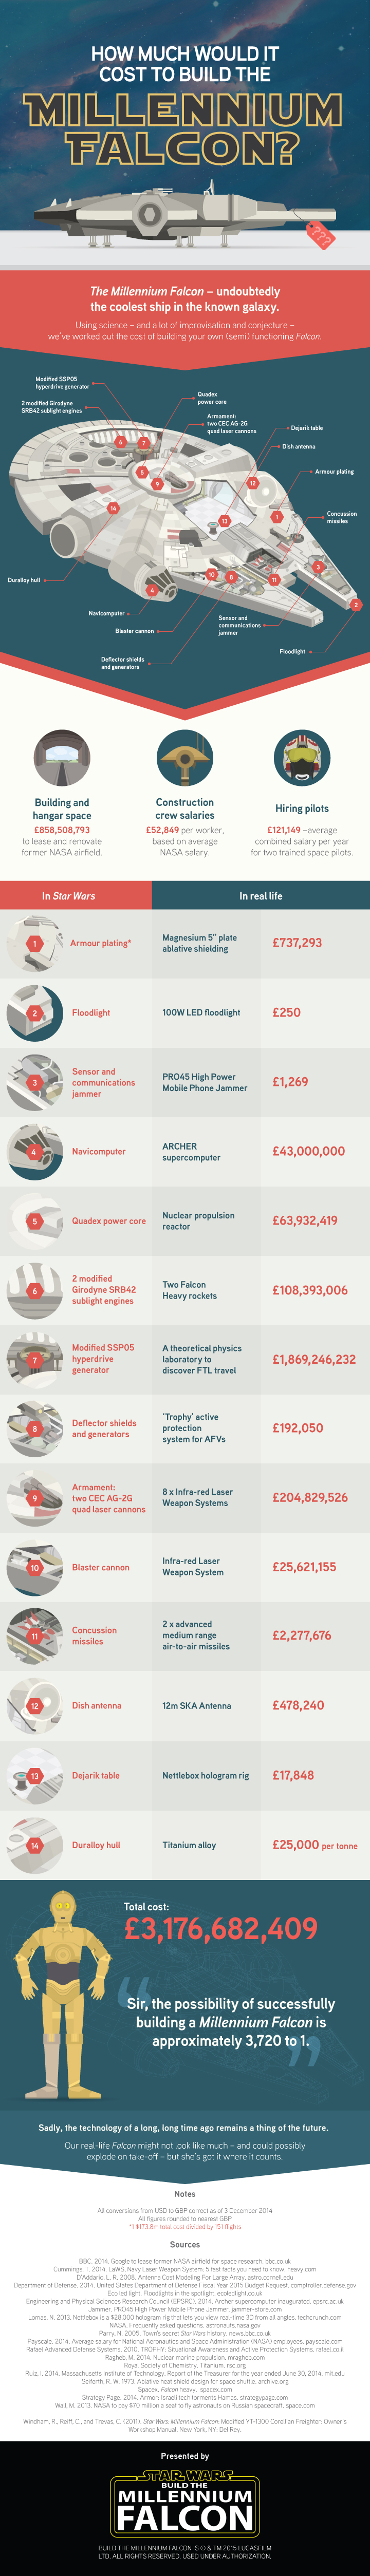 Millennium Falcon infographic